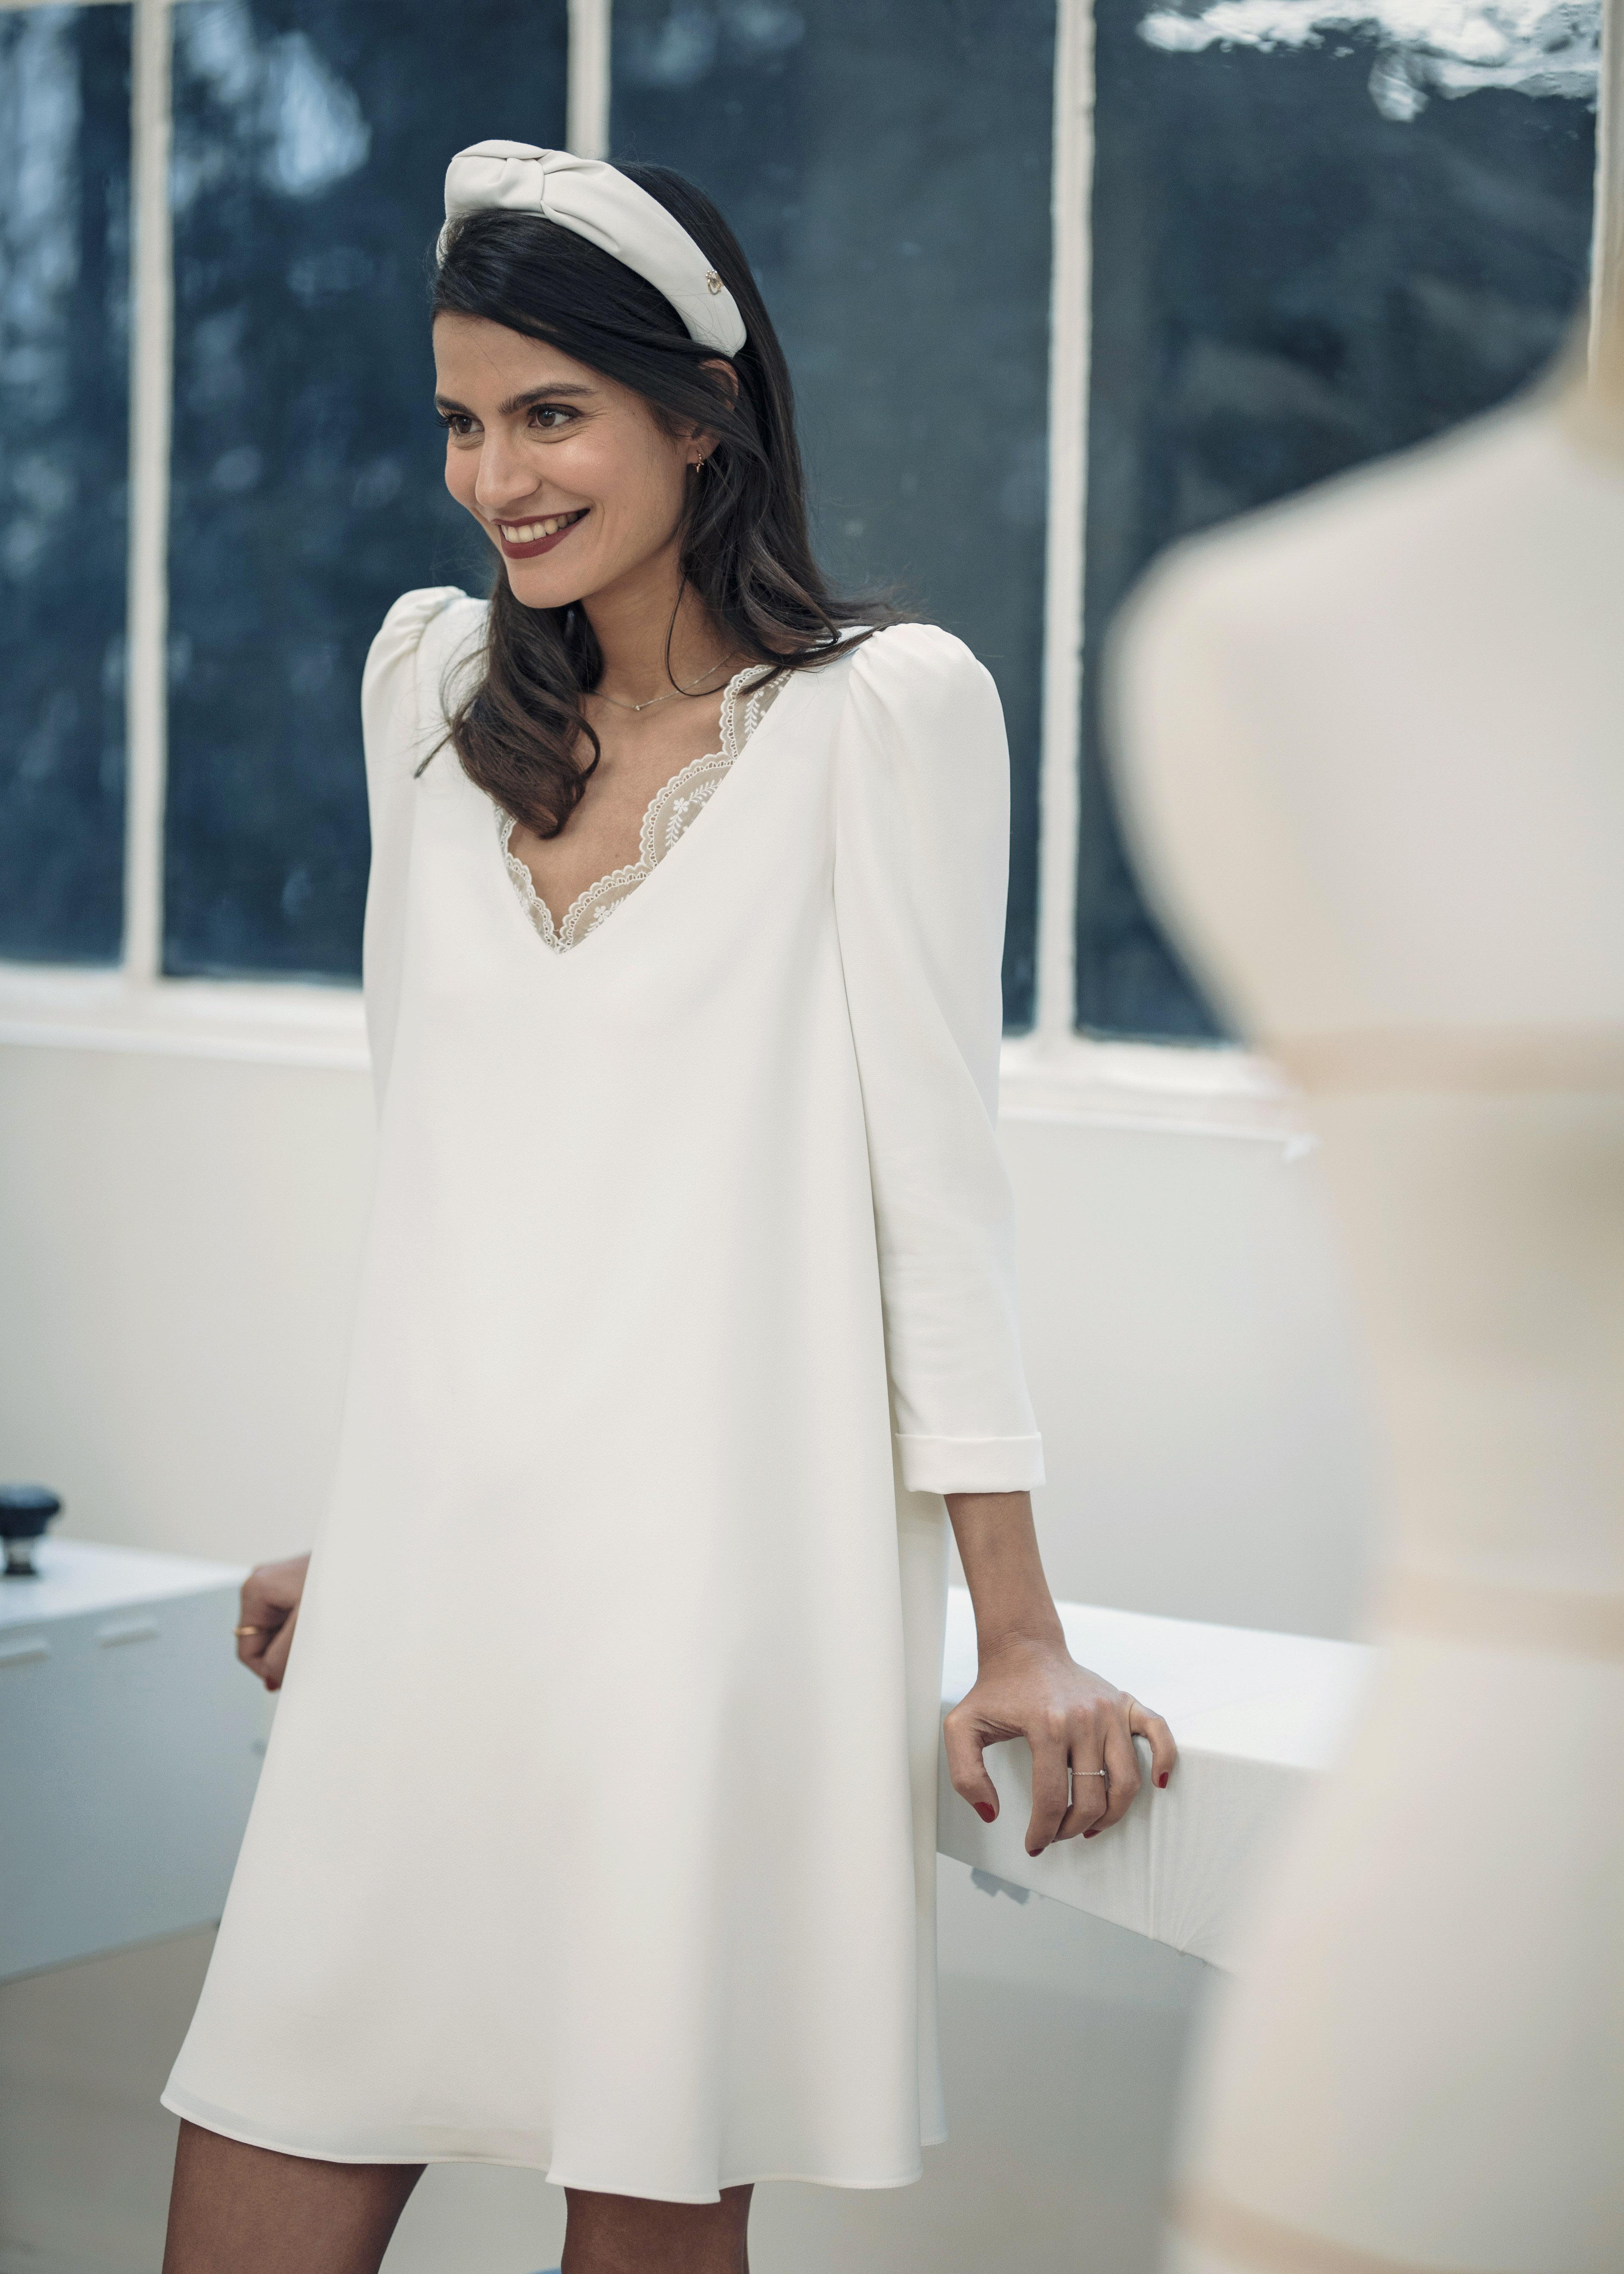 laure de sagazan short v-neck wedding dress spring 2019